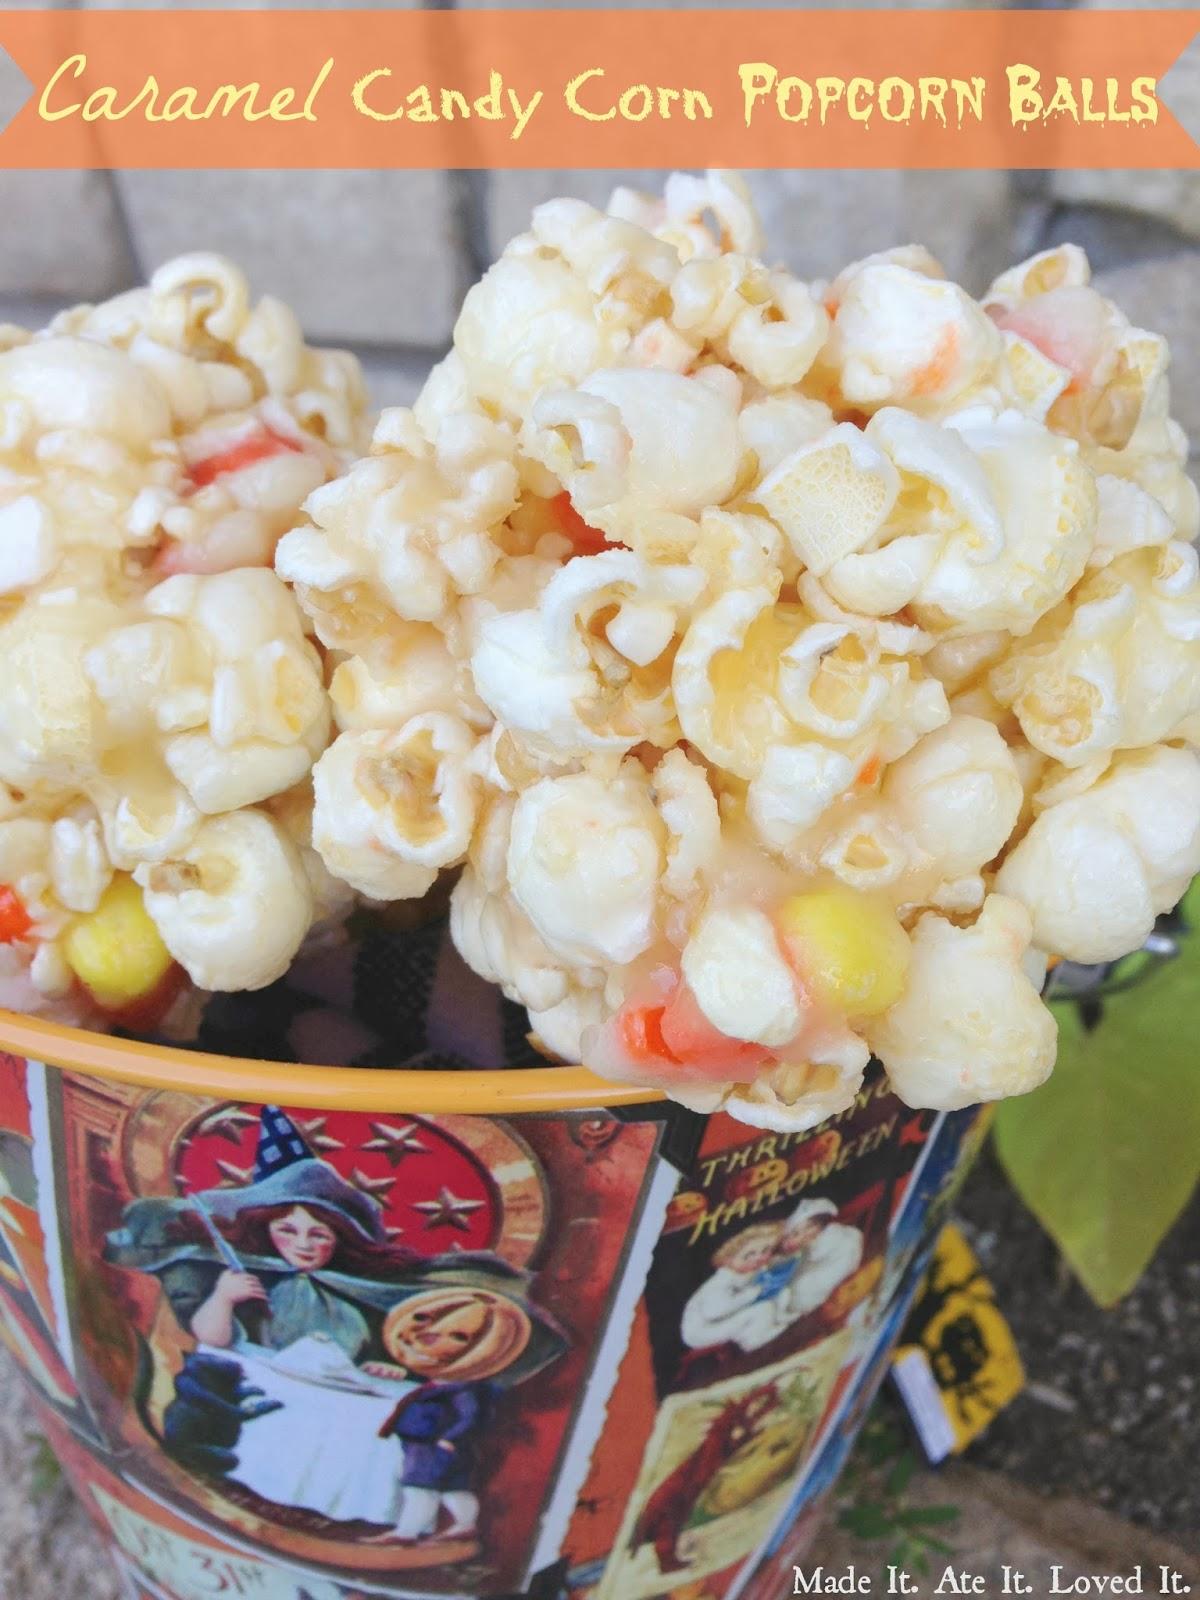 Made It. Ate It. Loved It.: Caramel Candy Corn Popcorn Balls